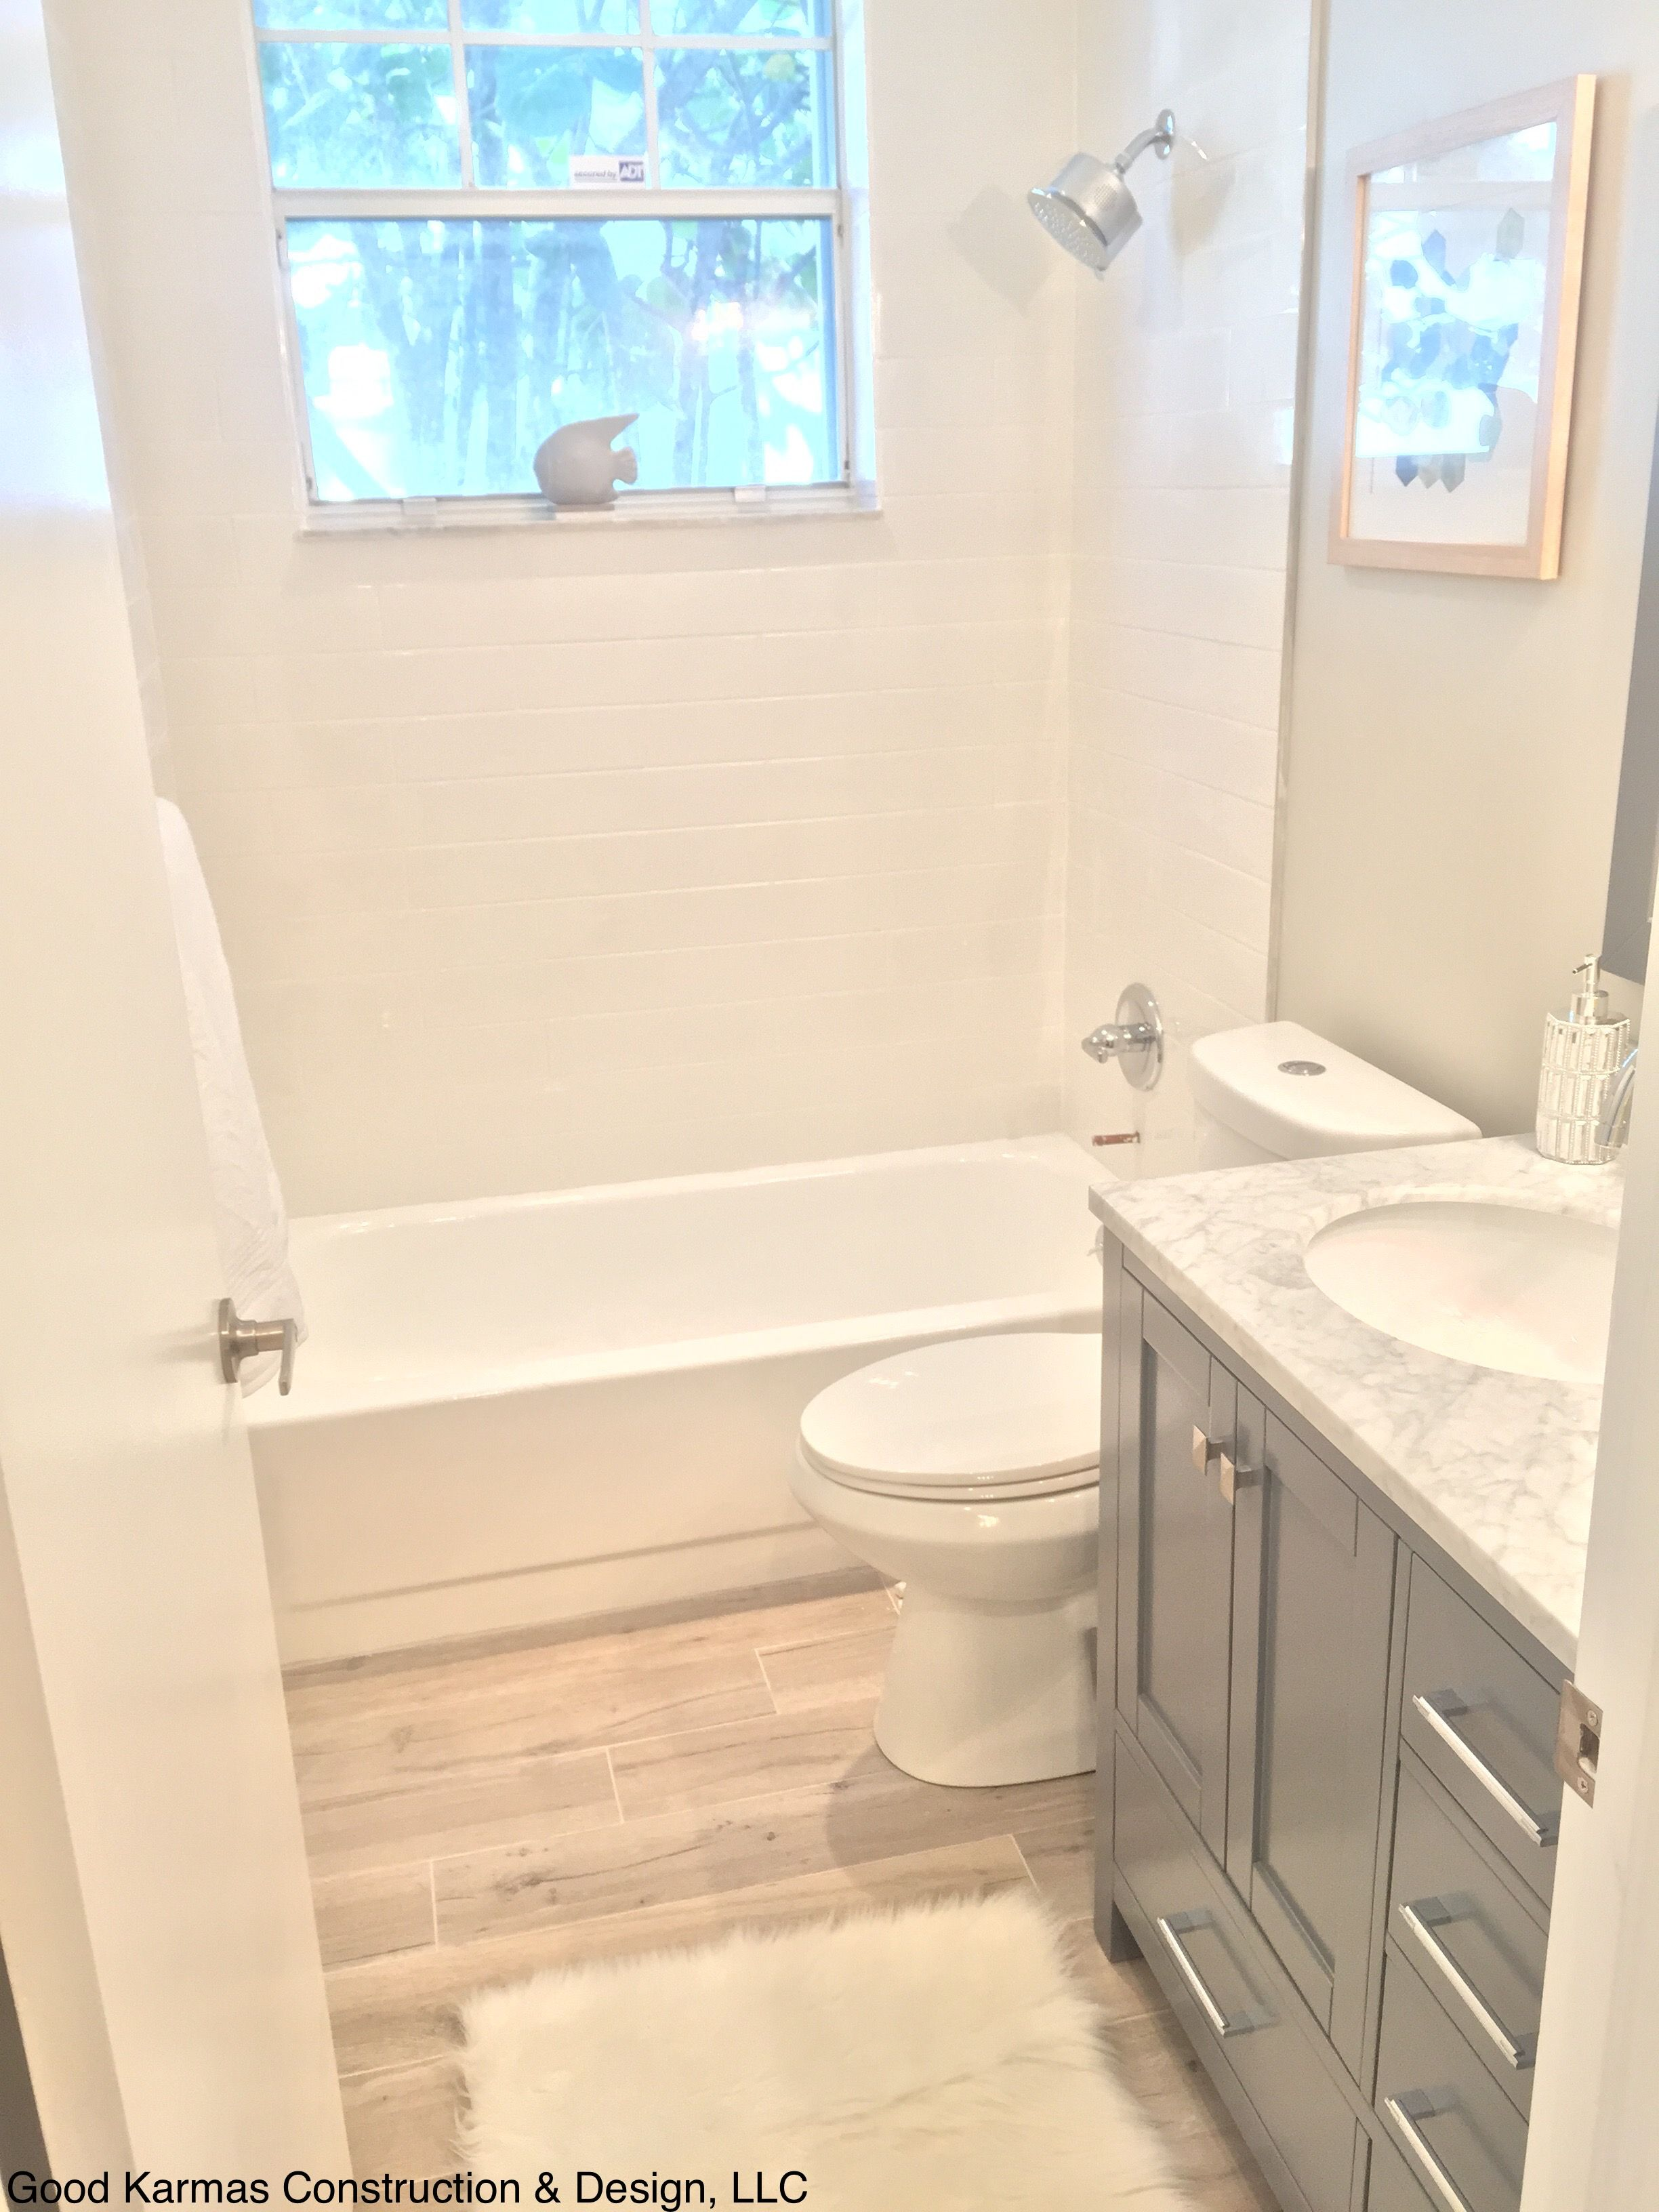 Bathroom vanities in south florida - Good Karmas Construction Design Llc South Florida Remodel Interiordesign Design